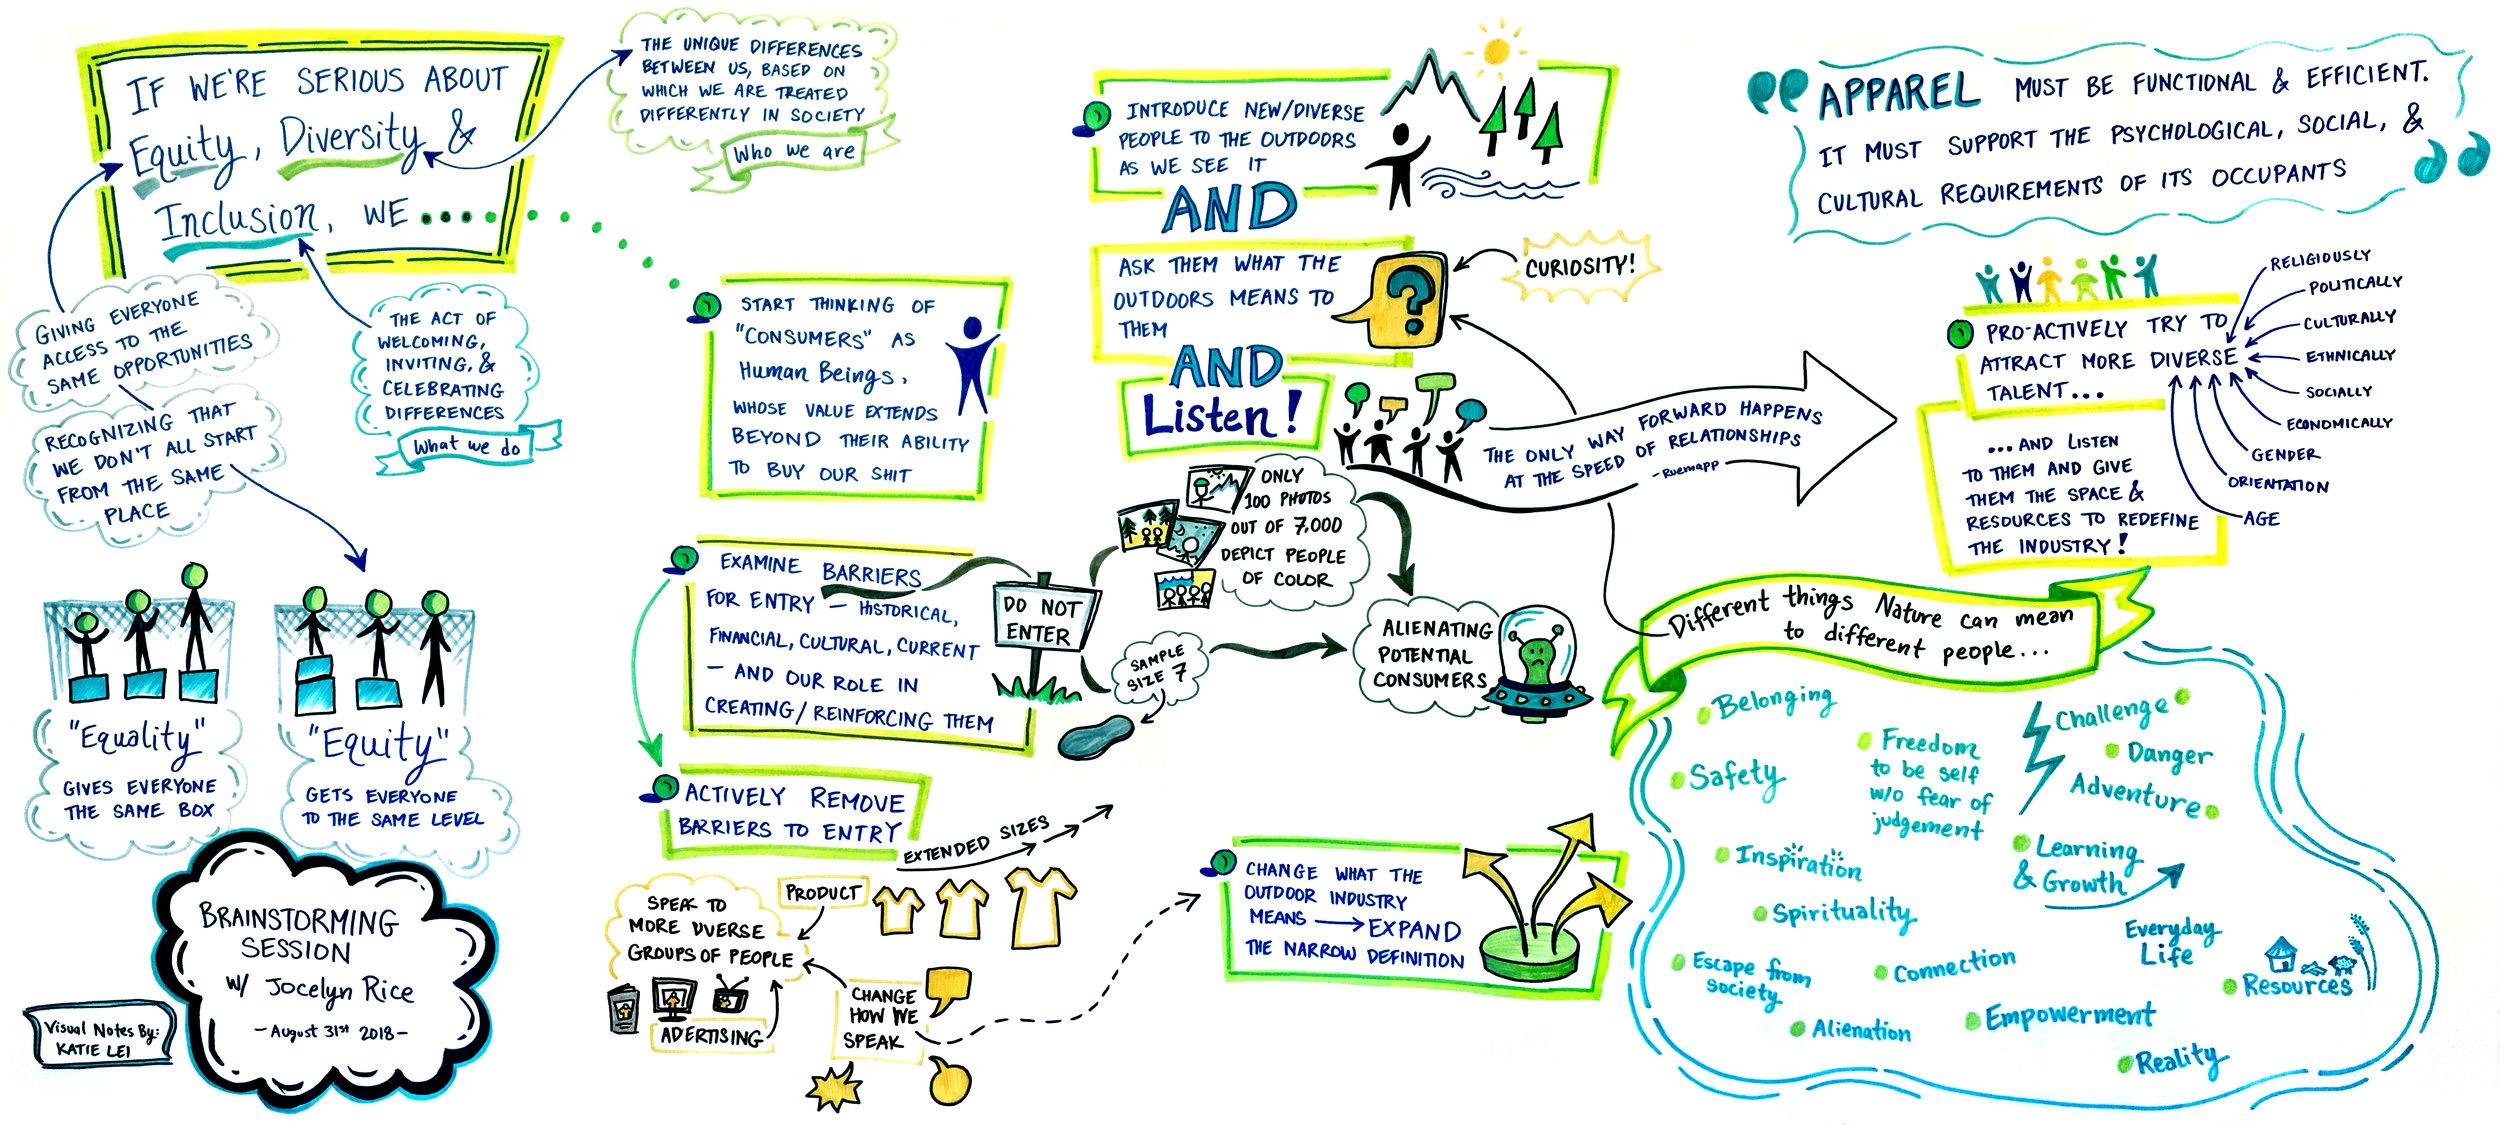 Equity, Diversity & Inclusion Brainstorm